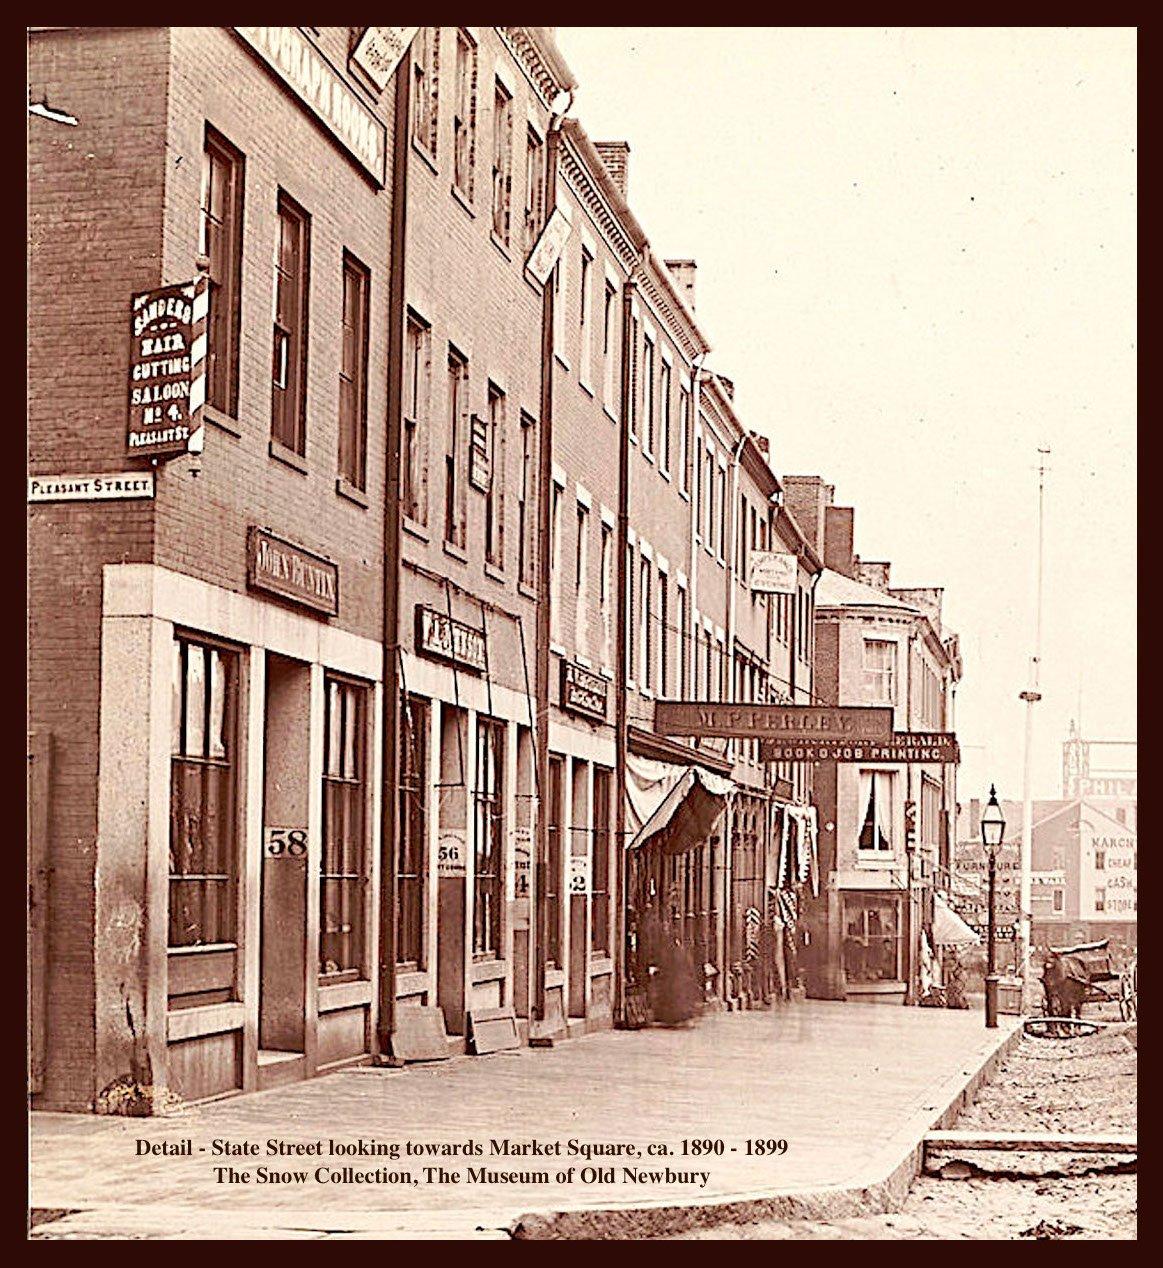 Newburyport, State Street looking towards Market Square, 1890 - 1899